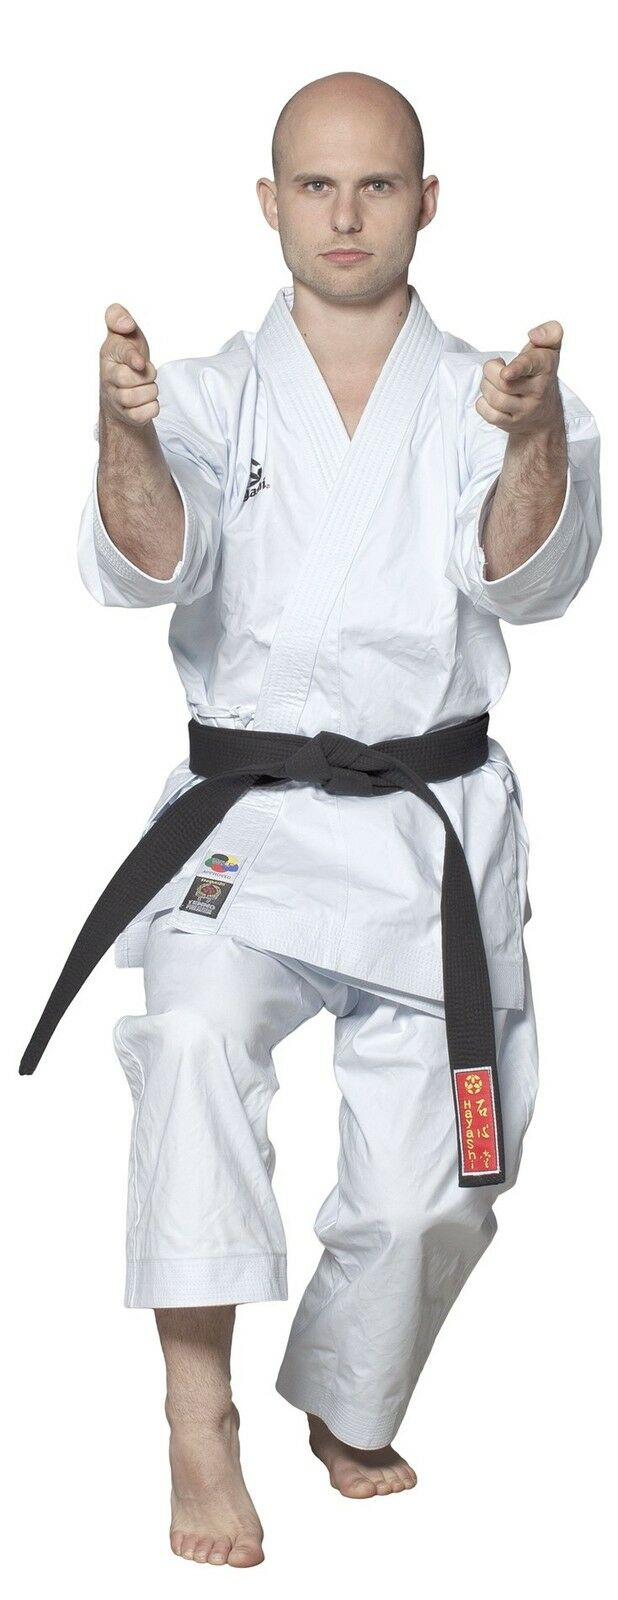 Karate Anzug TENNO 160, 165 u.170cm Offiziell WKF lizensiert. Budoland - Hayashi